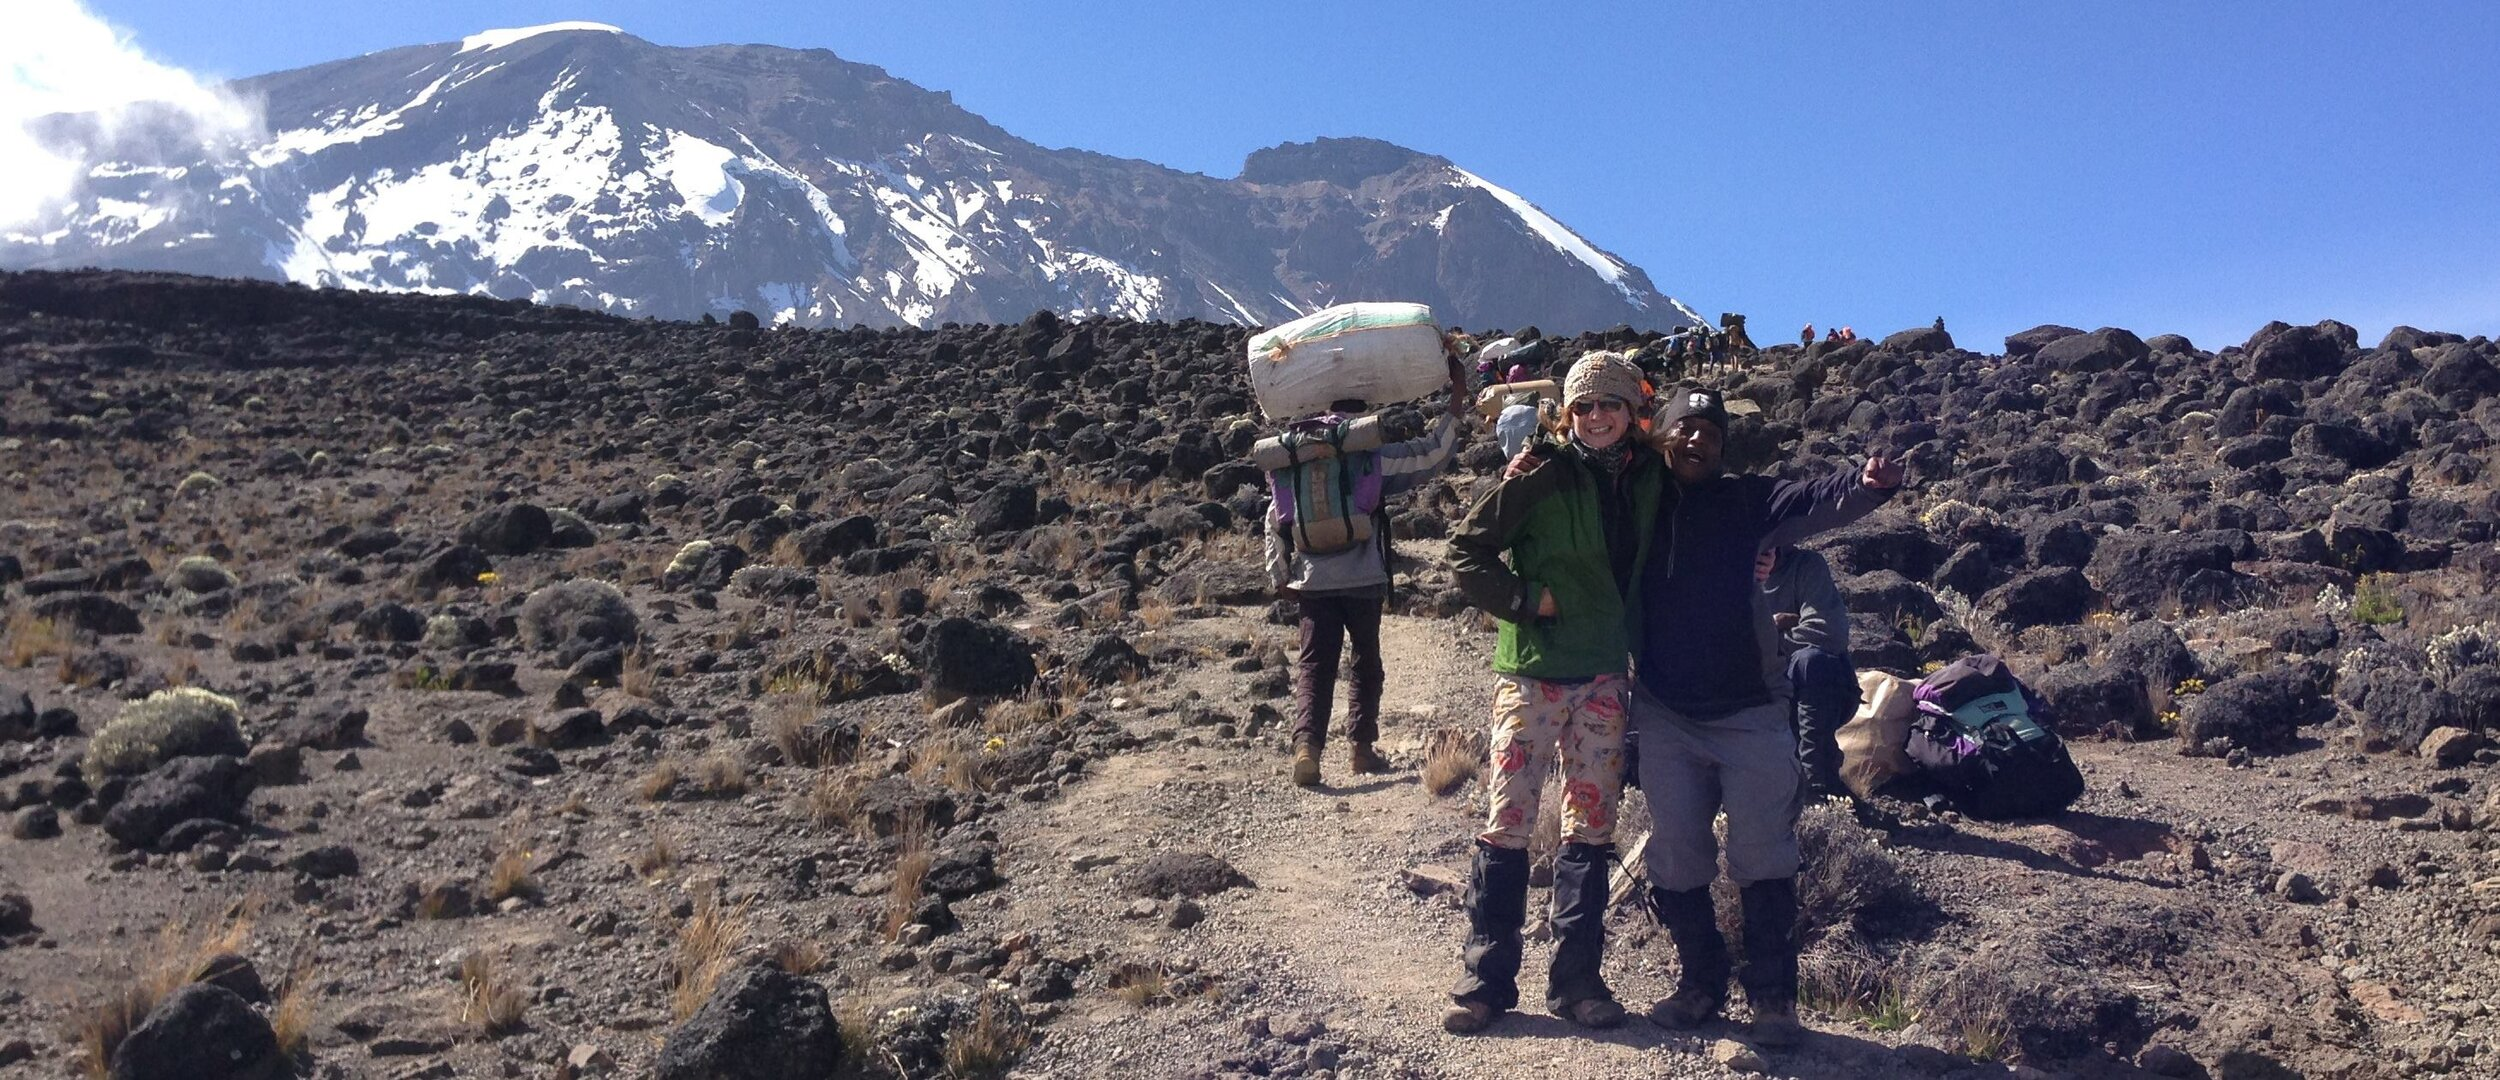 Dancing on Mount Kilimanjaro